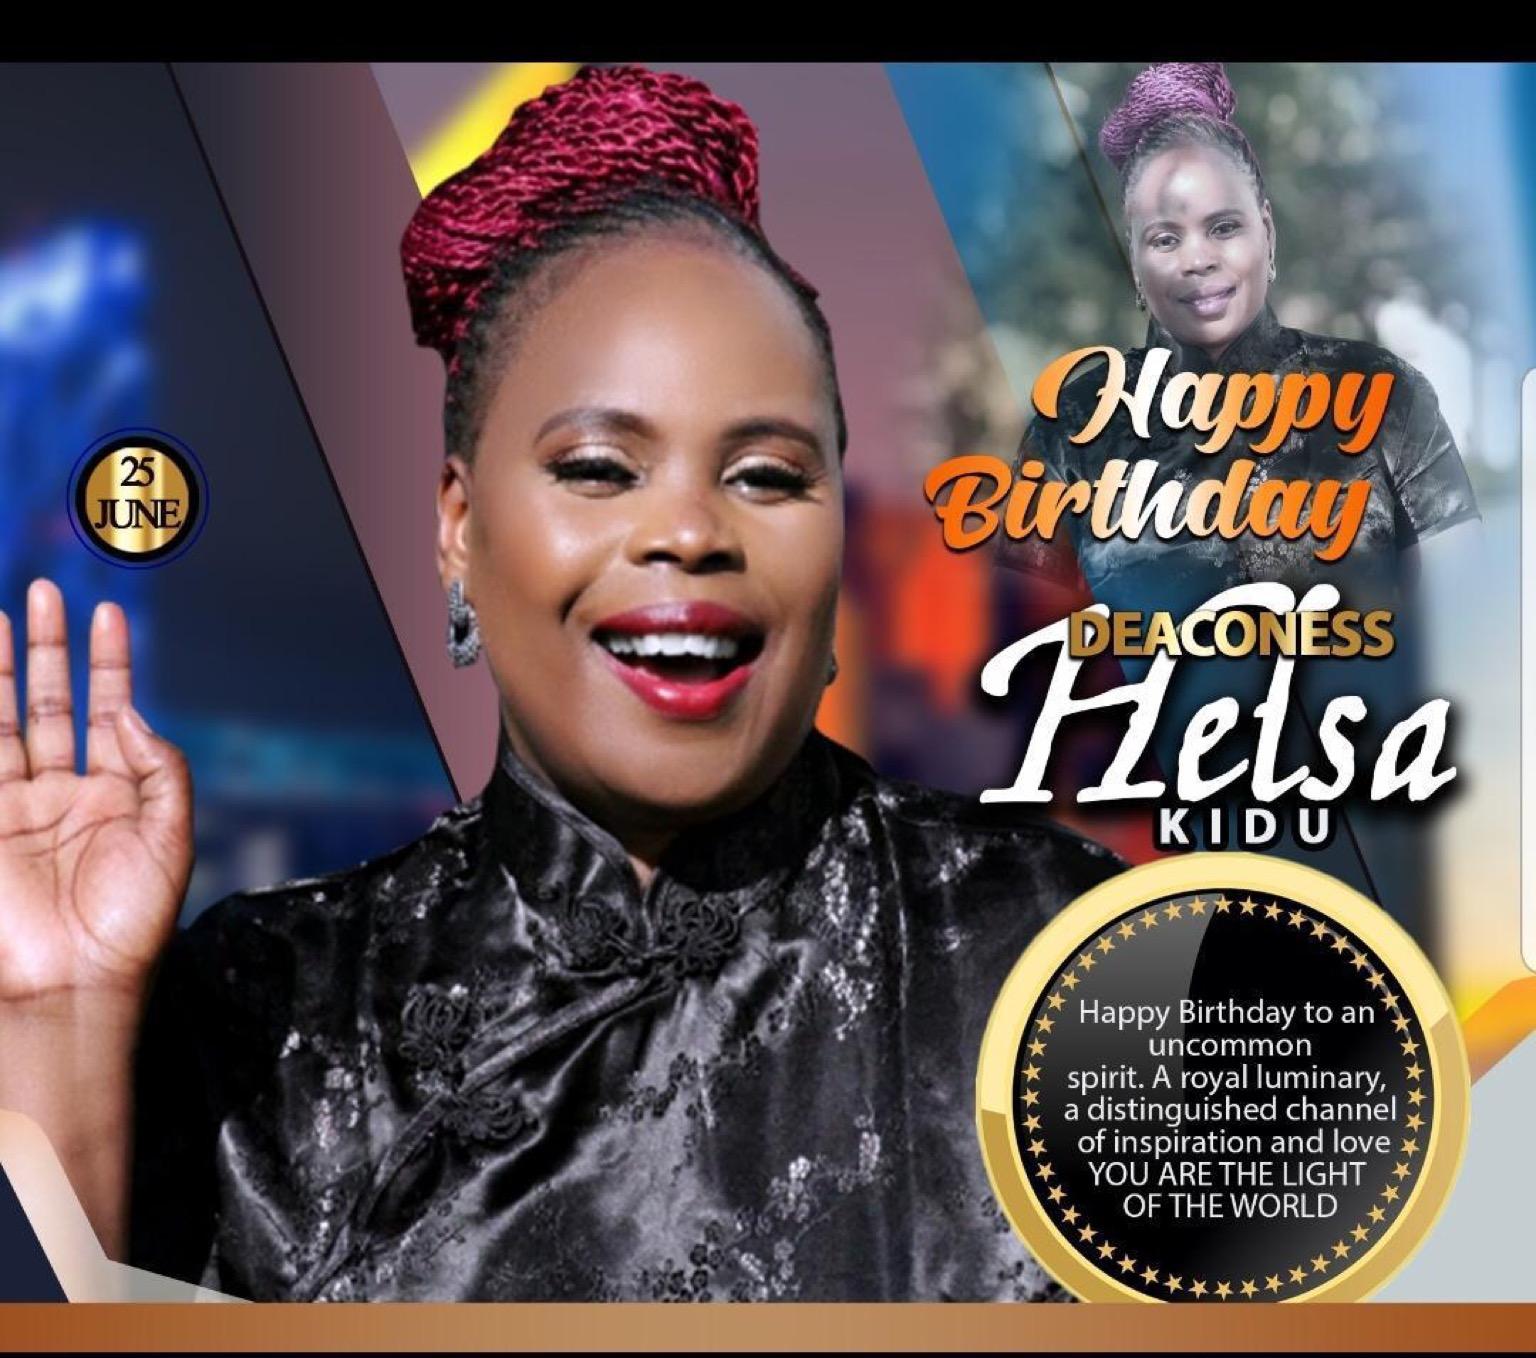 Happy a birthday Deaconess Helsa